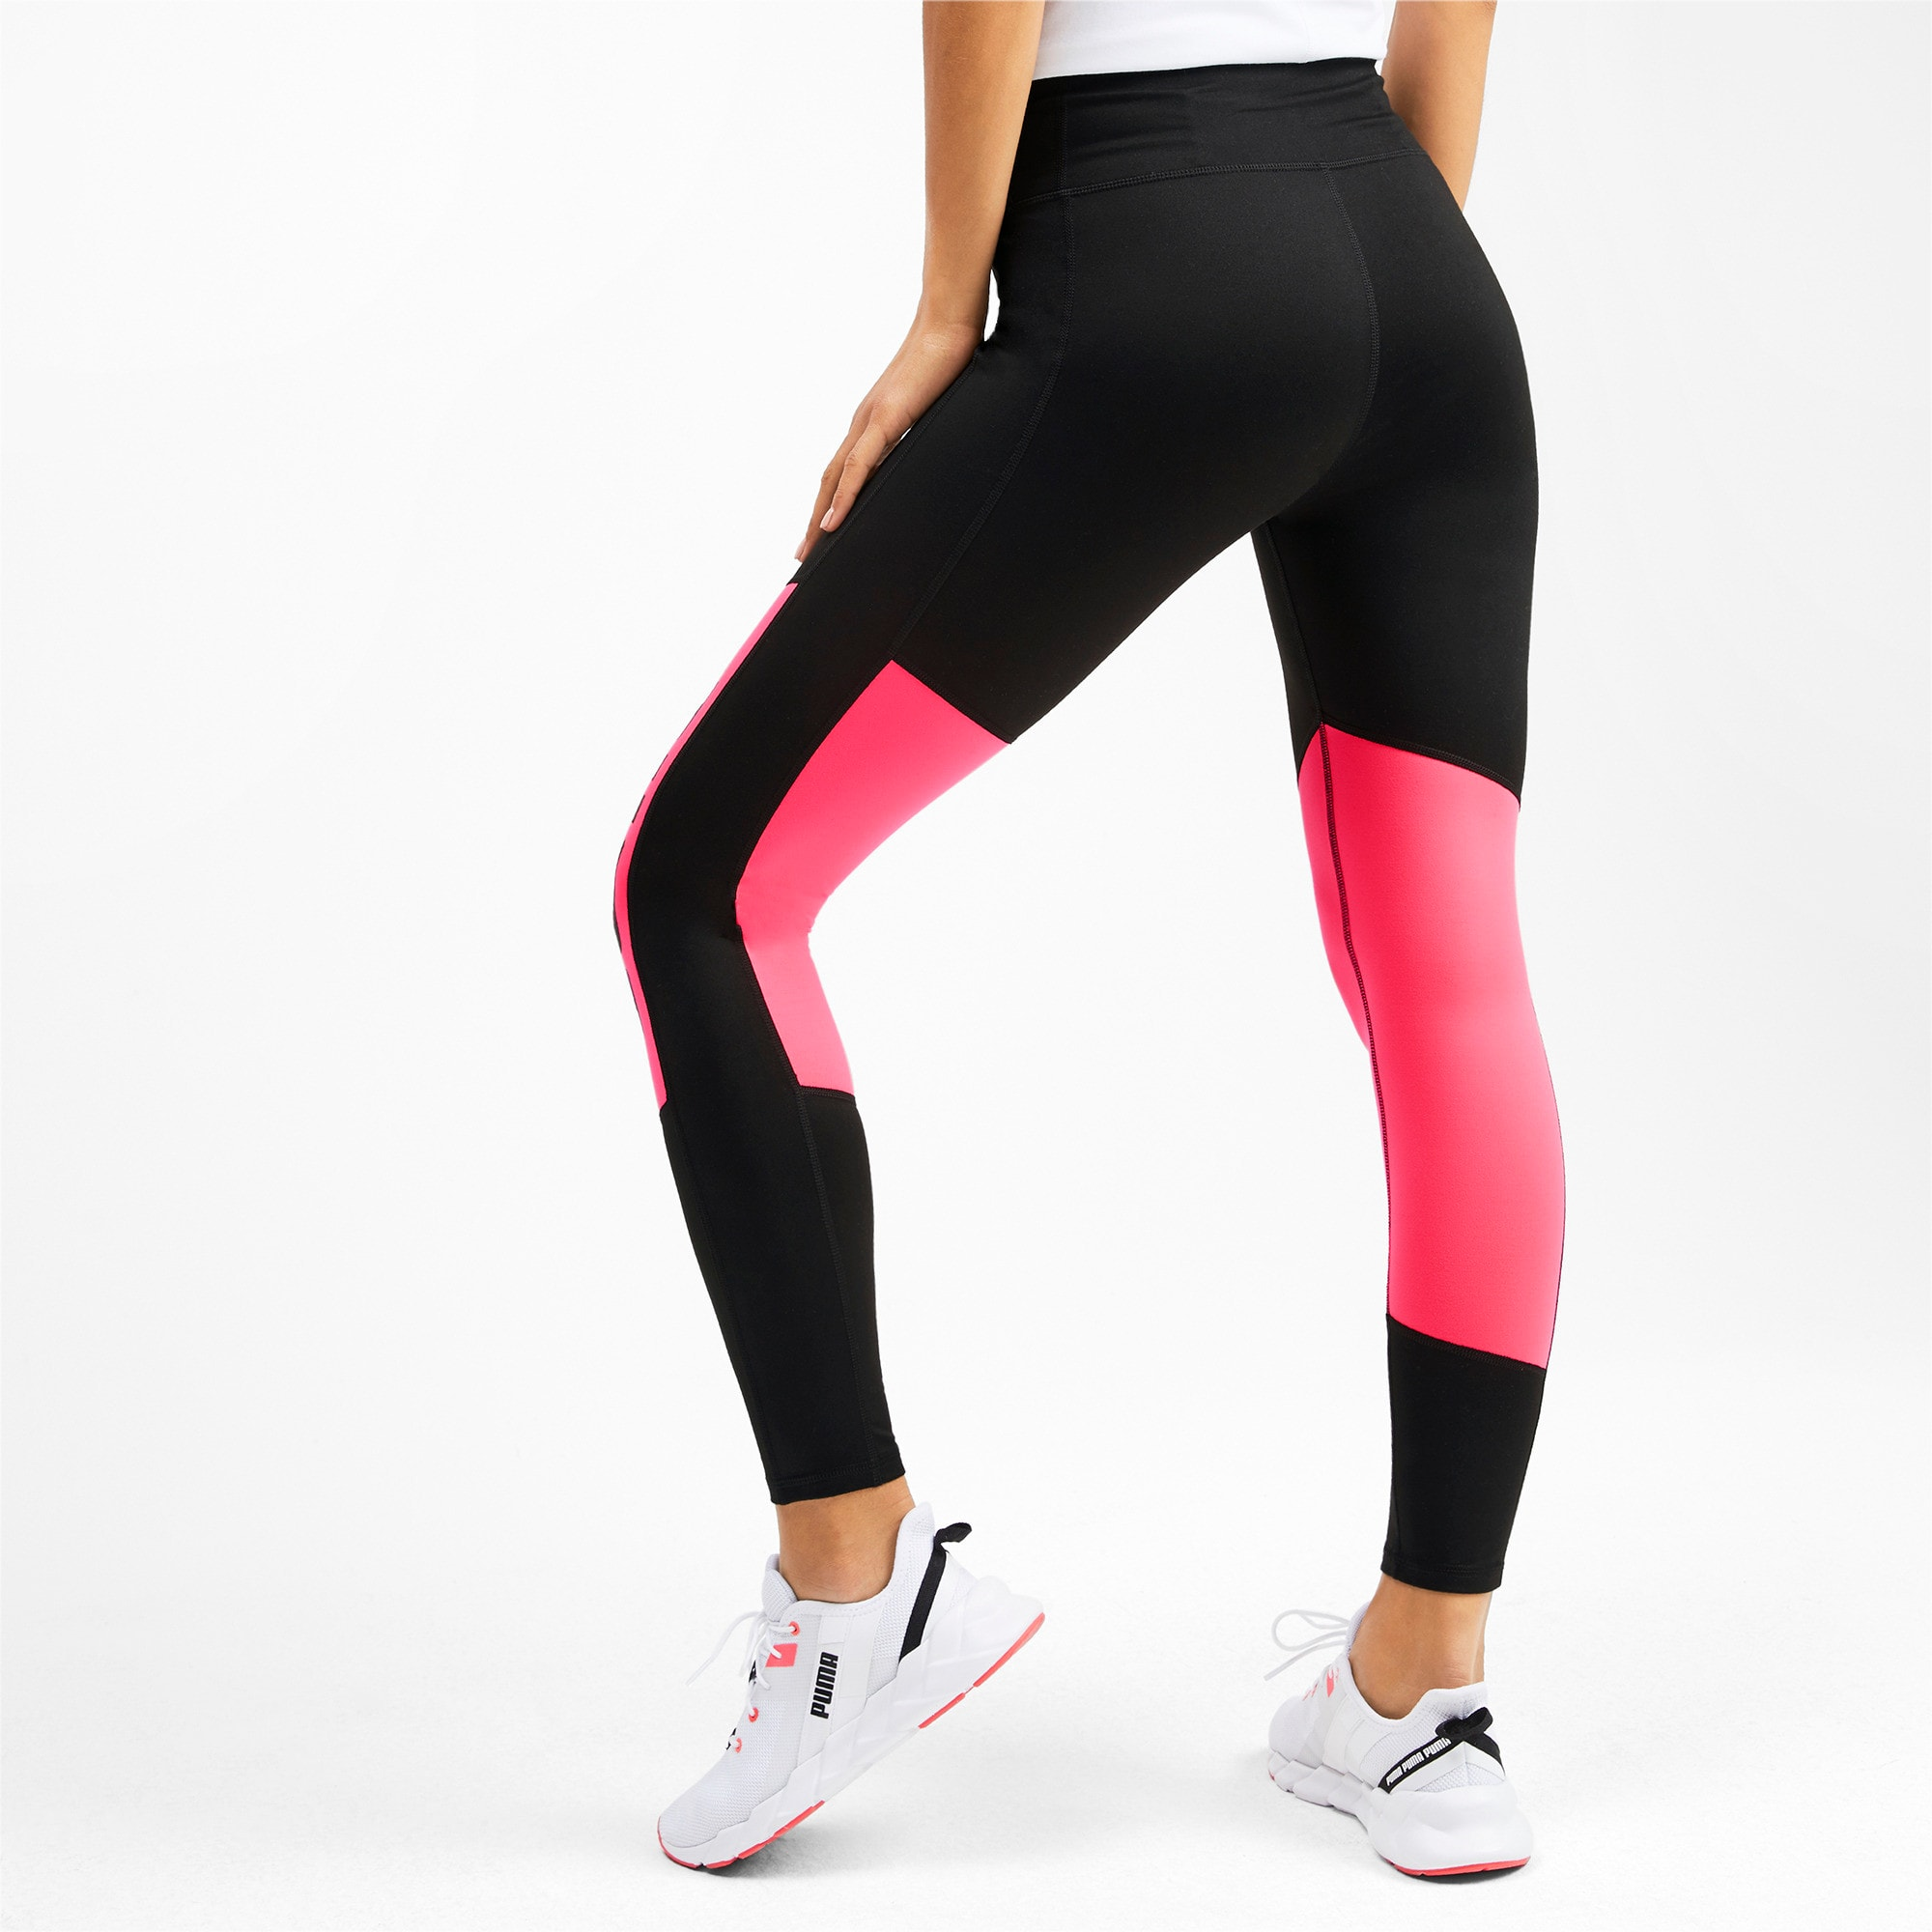 Thumbnail 2 of Logo Graphic Women's 7/8 Leggings, Puma Black-Pink Alert, medium